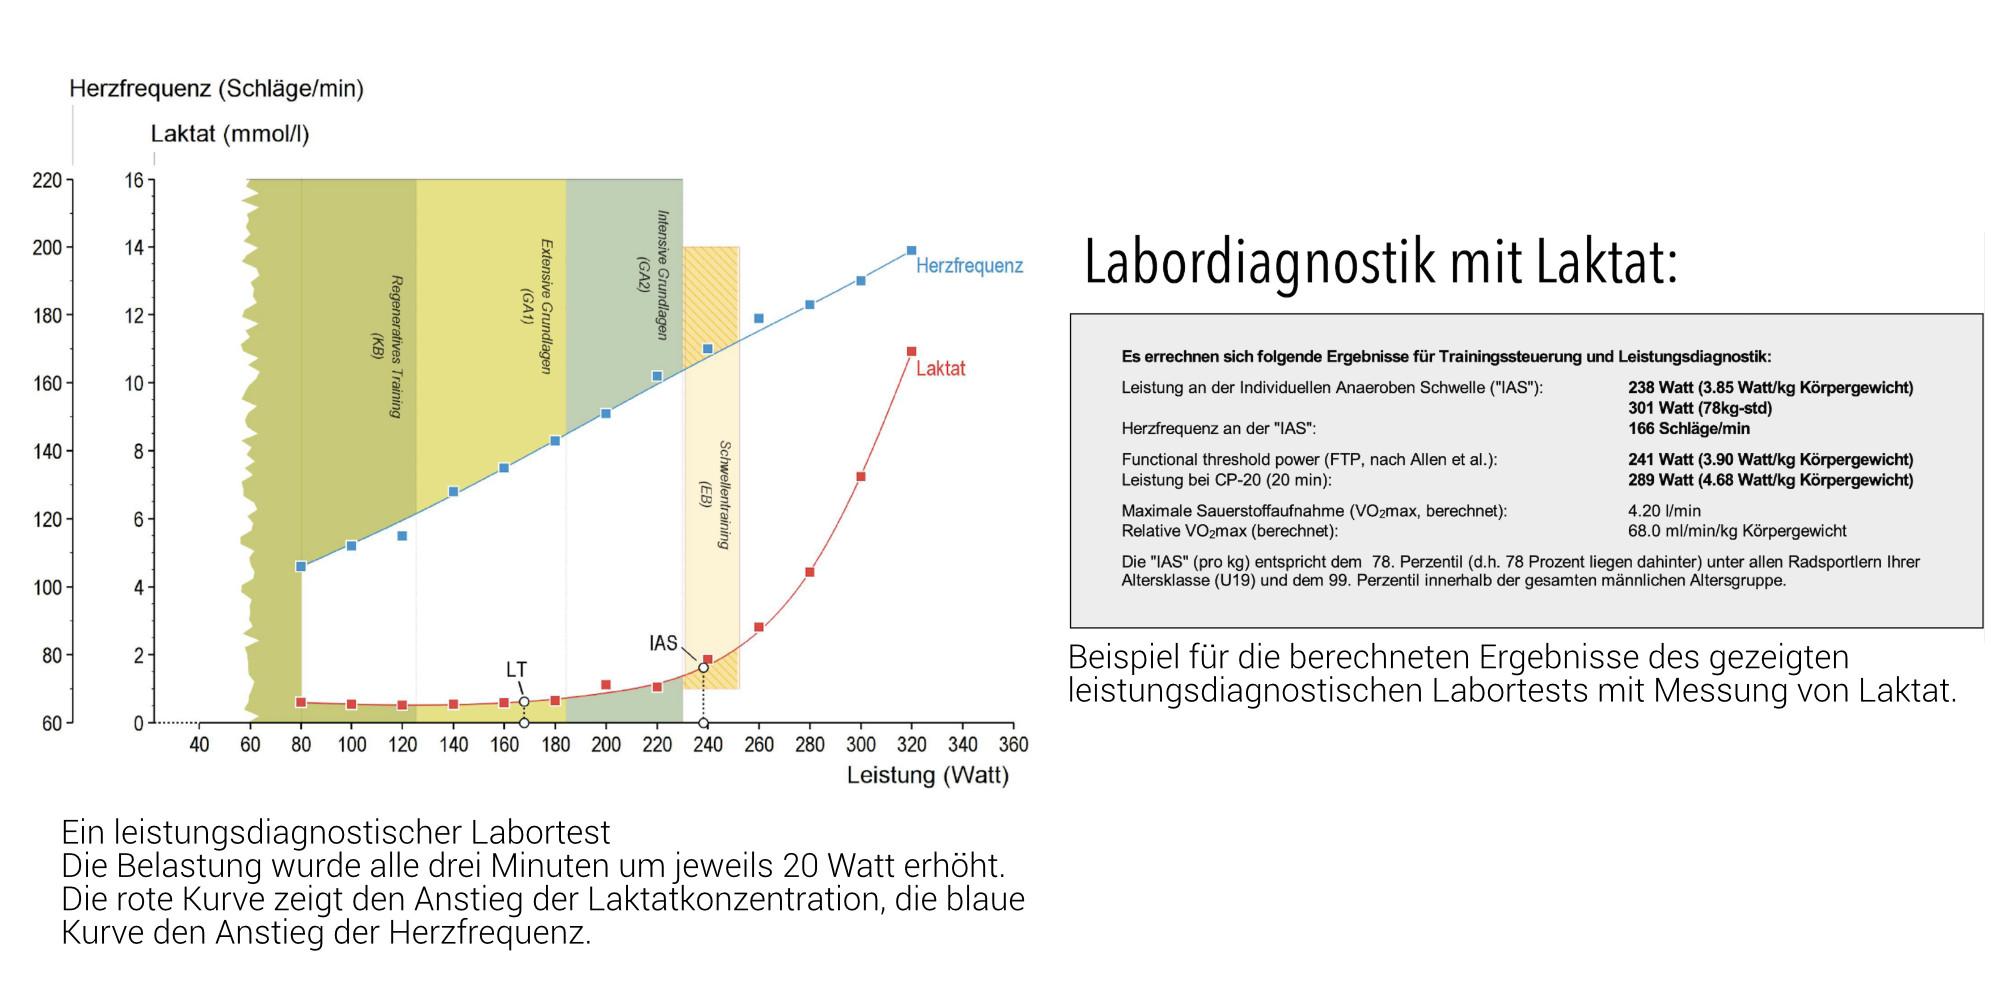 Radlabor-Blog-Diagnostik-mit-LaktatrMeEvlV6K9Ckv